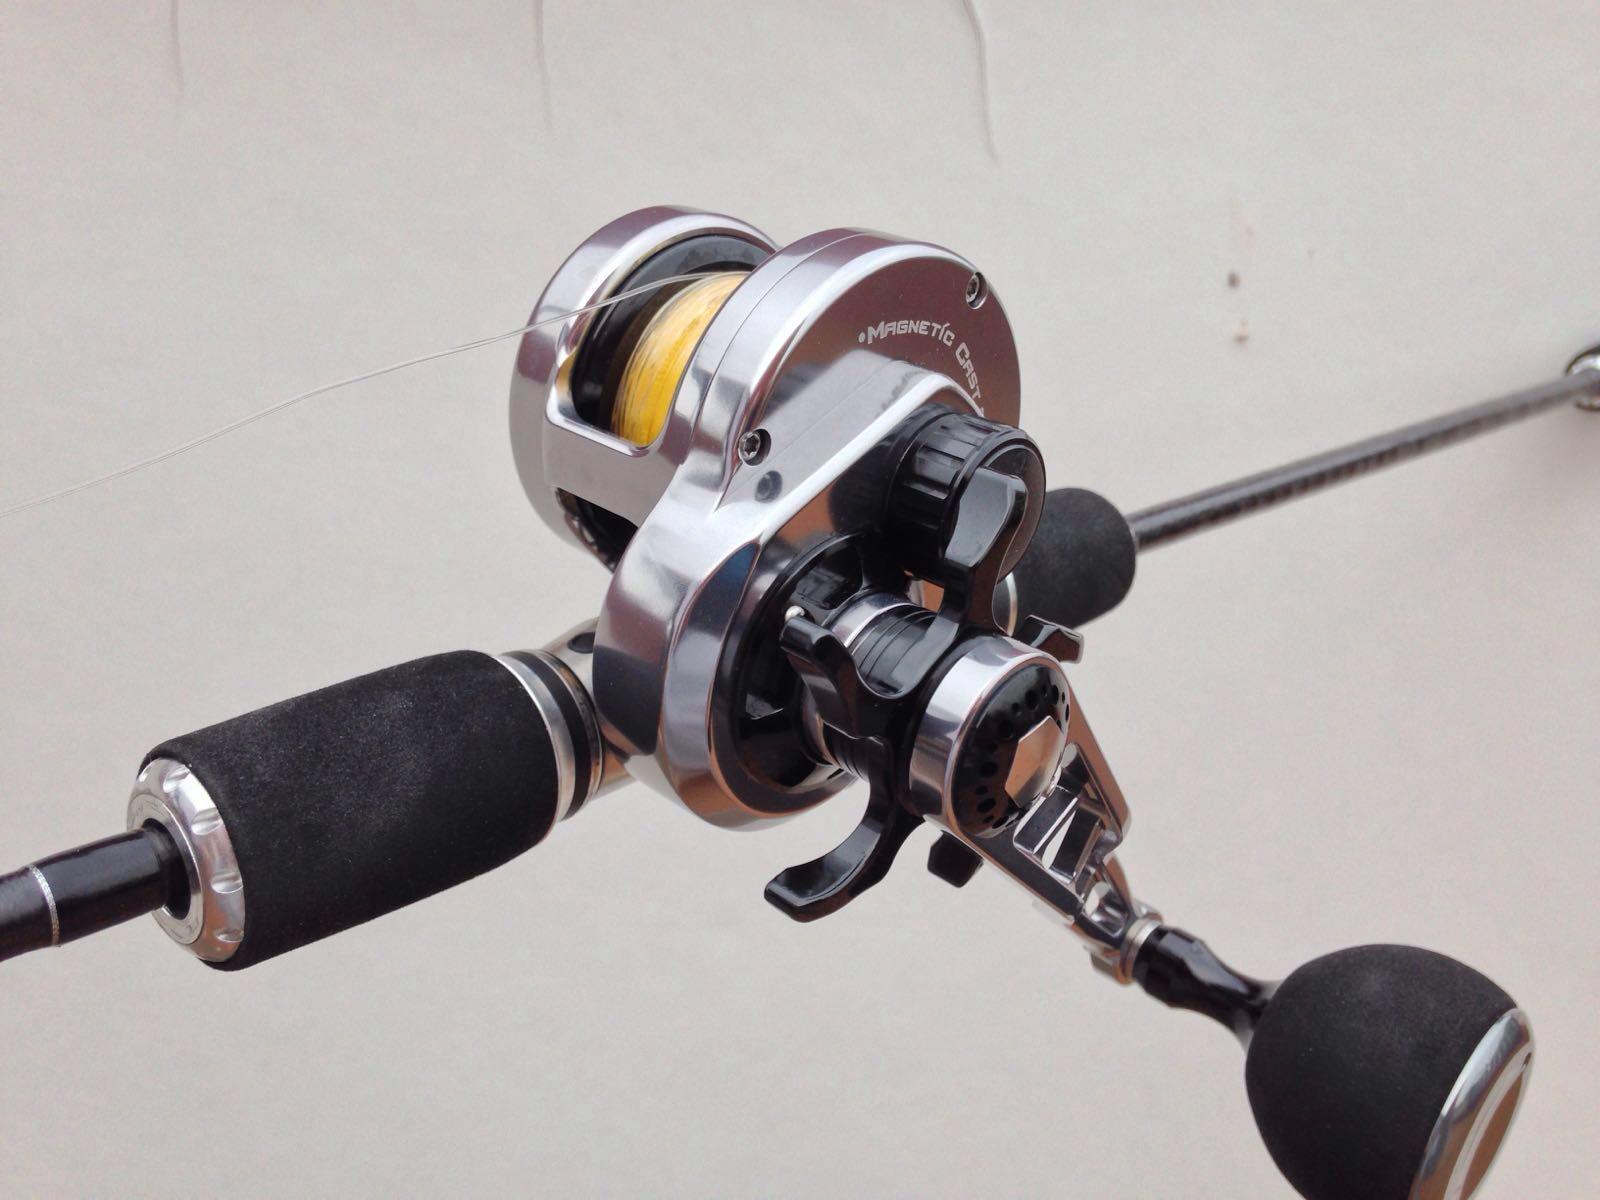 A diferencia de la pesca con vivo del capitulo anterior el slow jigging  requiere un material distinto.Consta de un carrete ligero 53e1559e84f